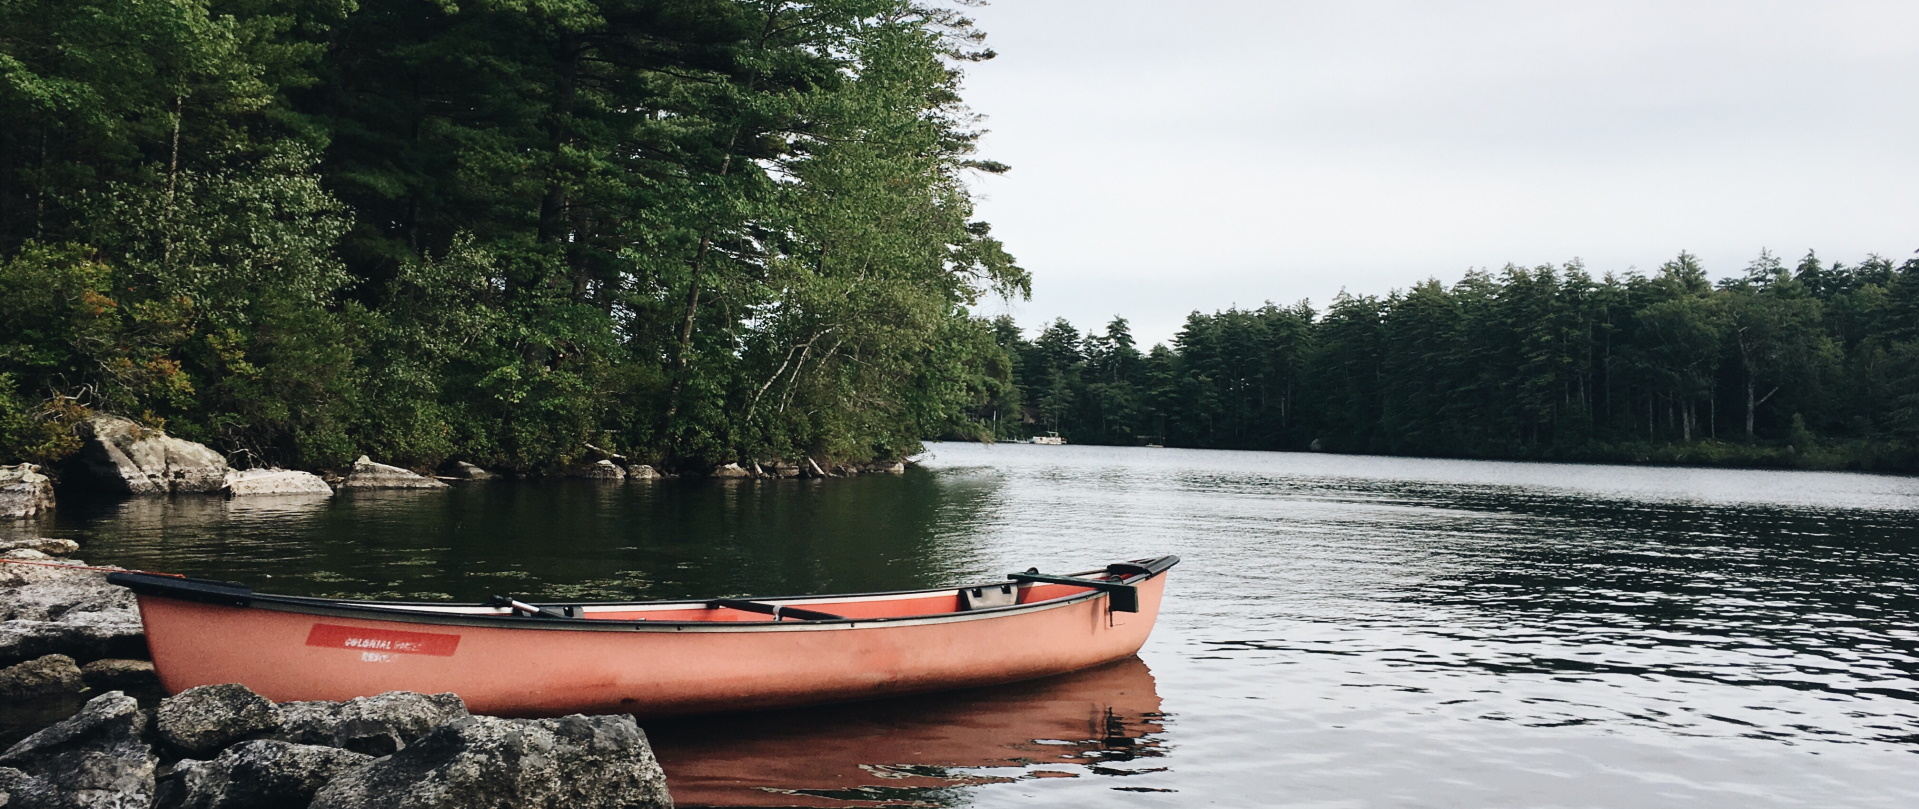 kayaking on the lake in new hampshire VPP54BD